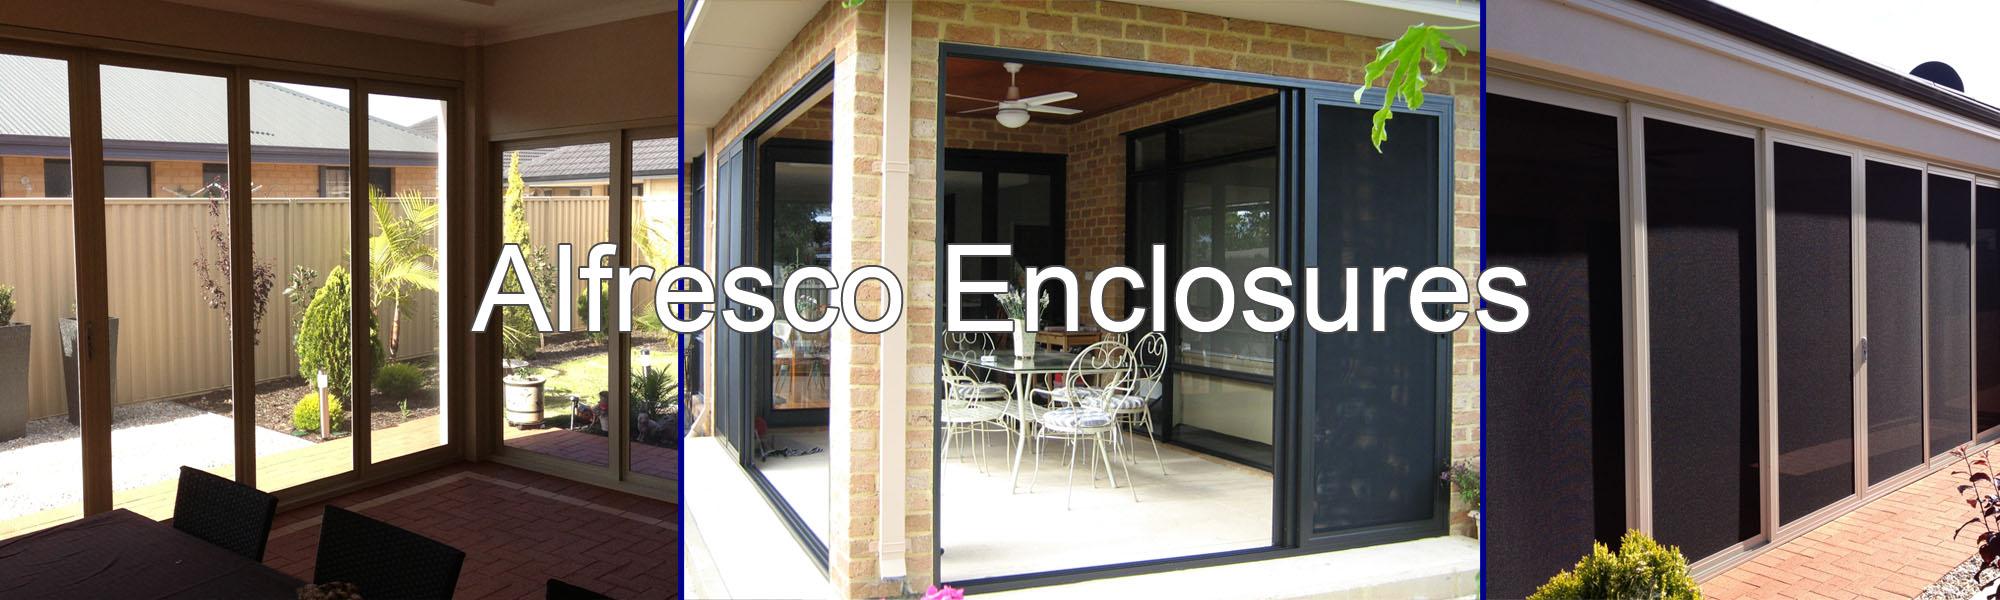 Alfresco Enclosures Baldivis Mandurah And Rockingham